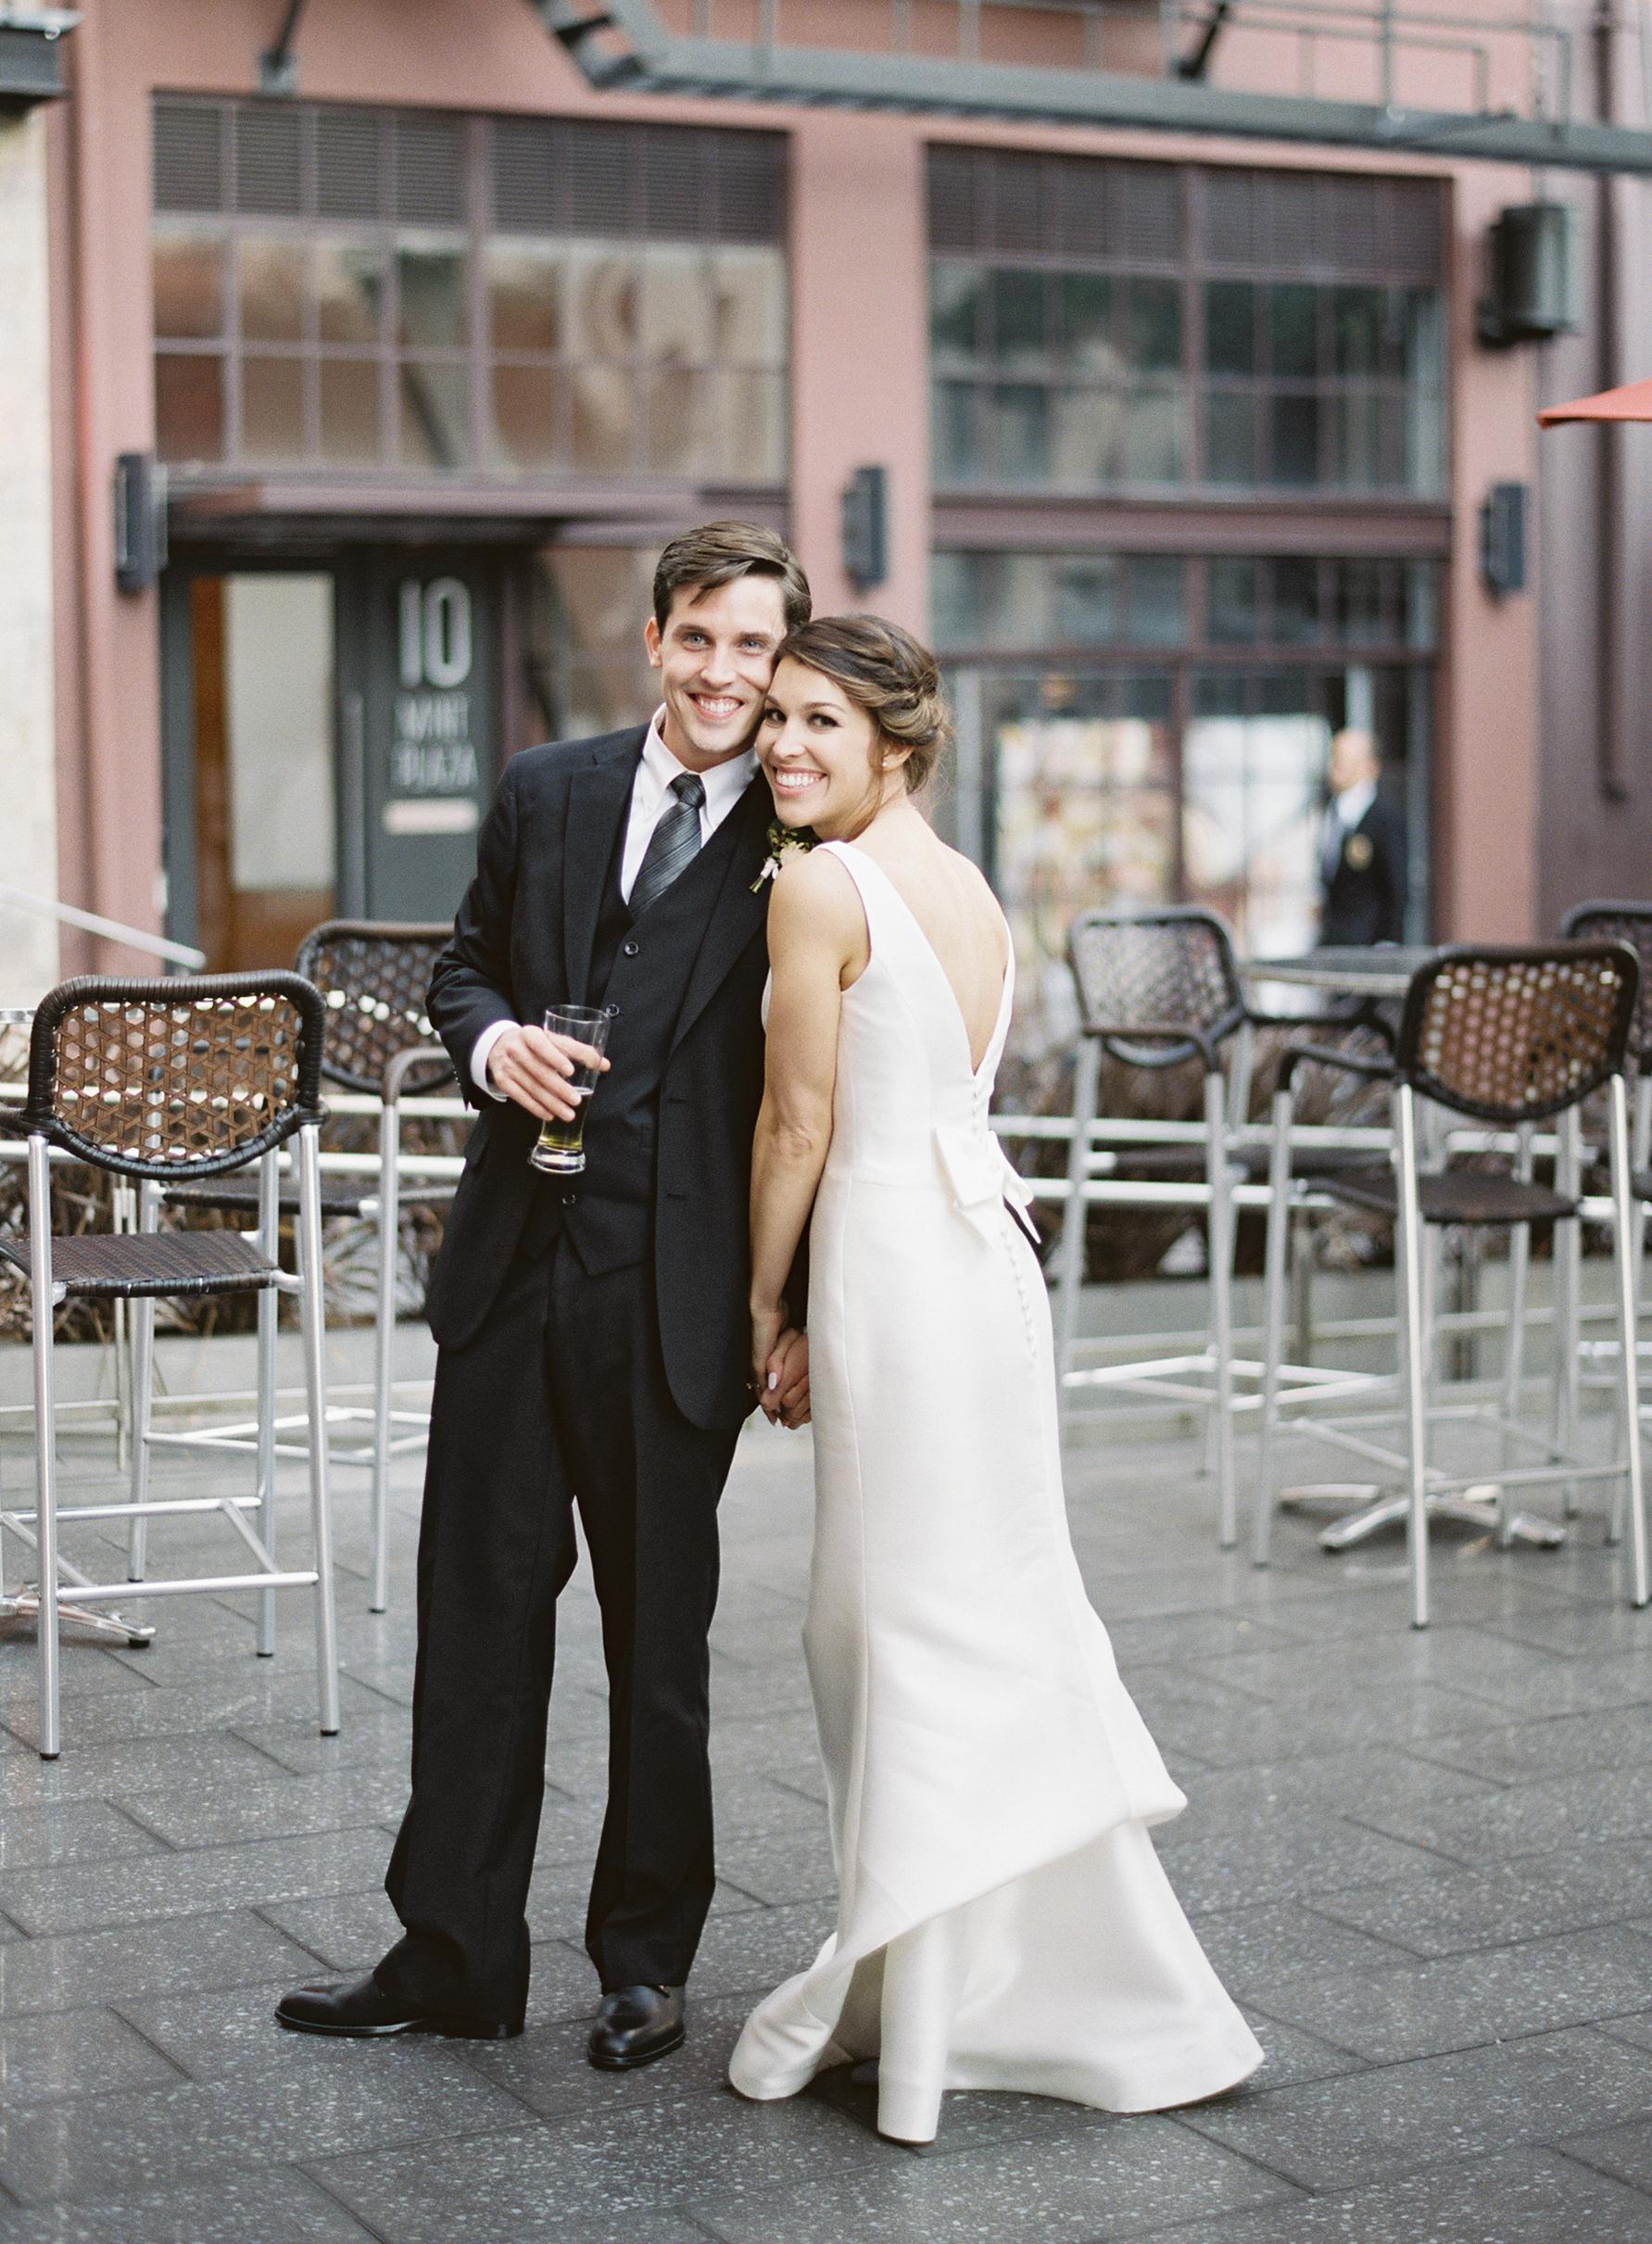 Meghan Mehan Photography - California Wedding Photographer | San Francisco City Hall Wedding 109.jpg